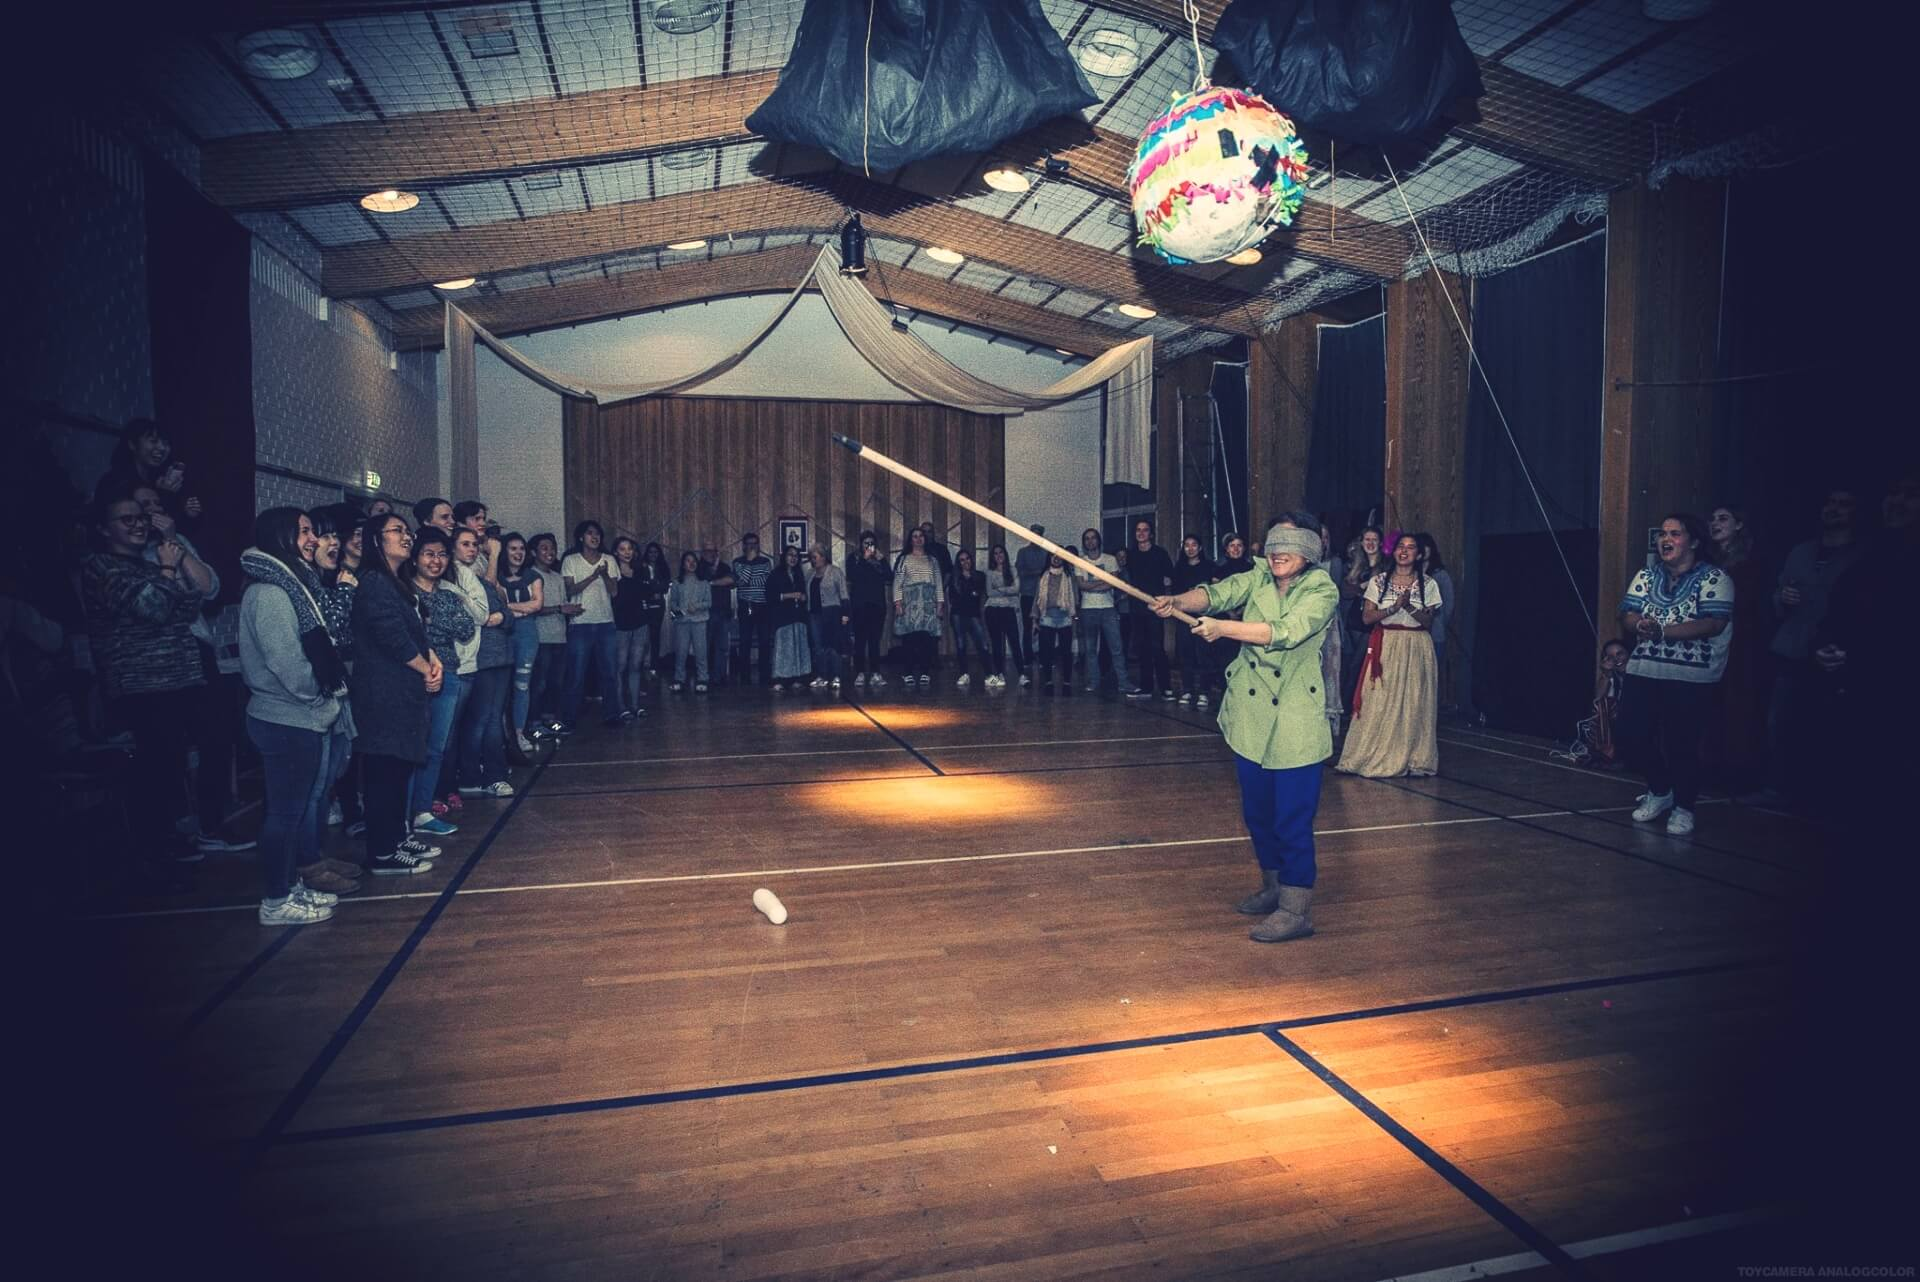 IPC - Folk high school cultural evening at International People's College in Denmark4